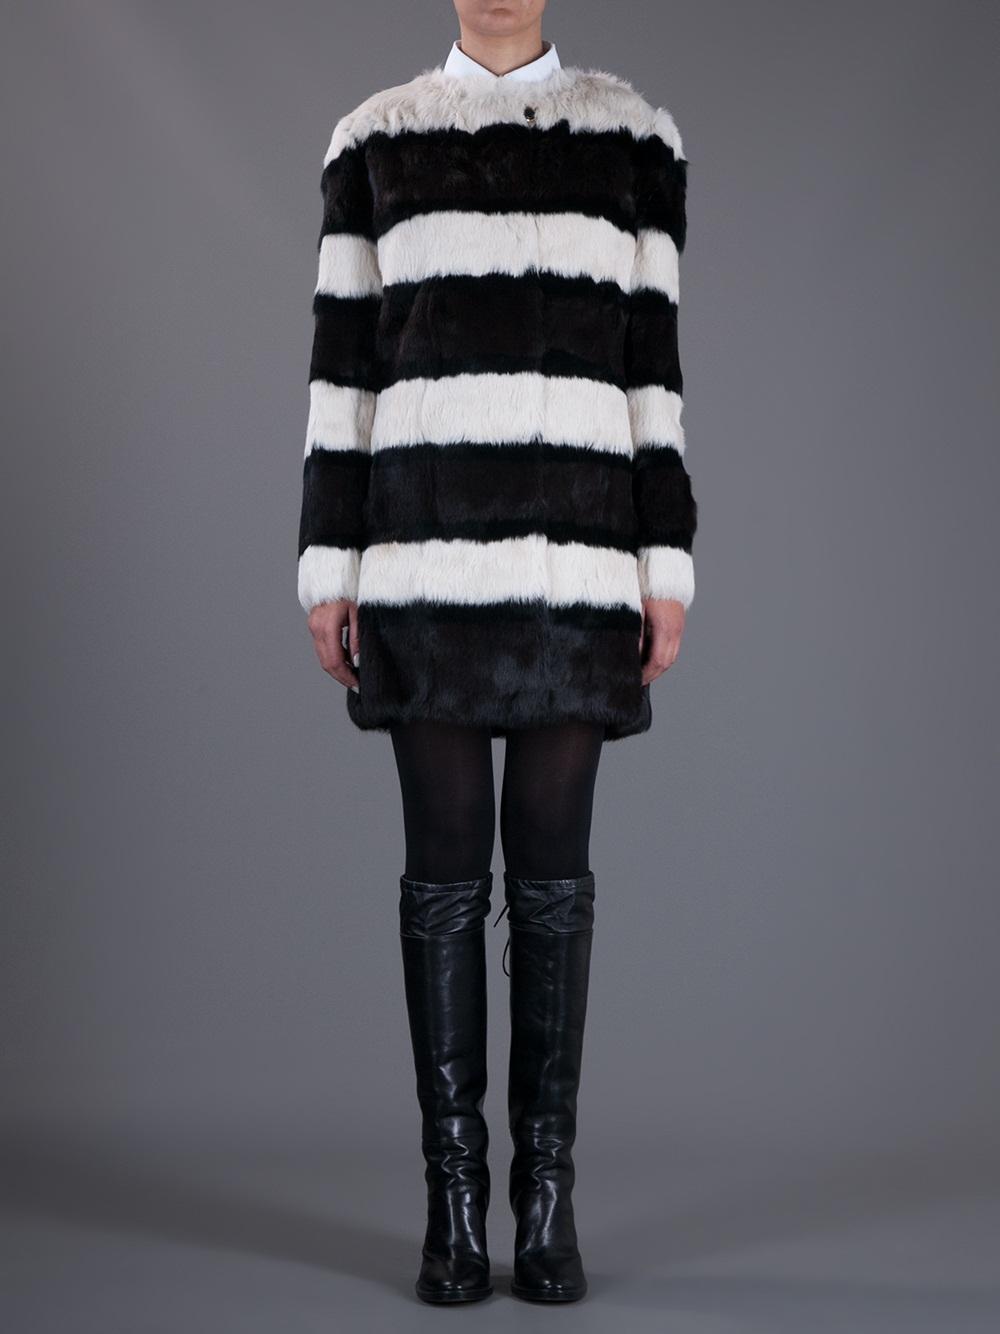 Lyst Tory Burch Striped Rabbit Fur Coat In Black